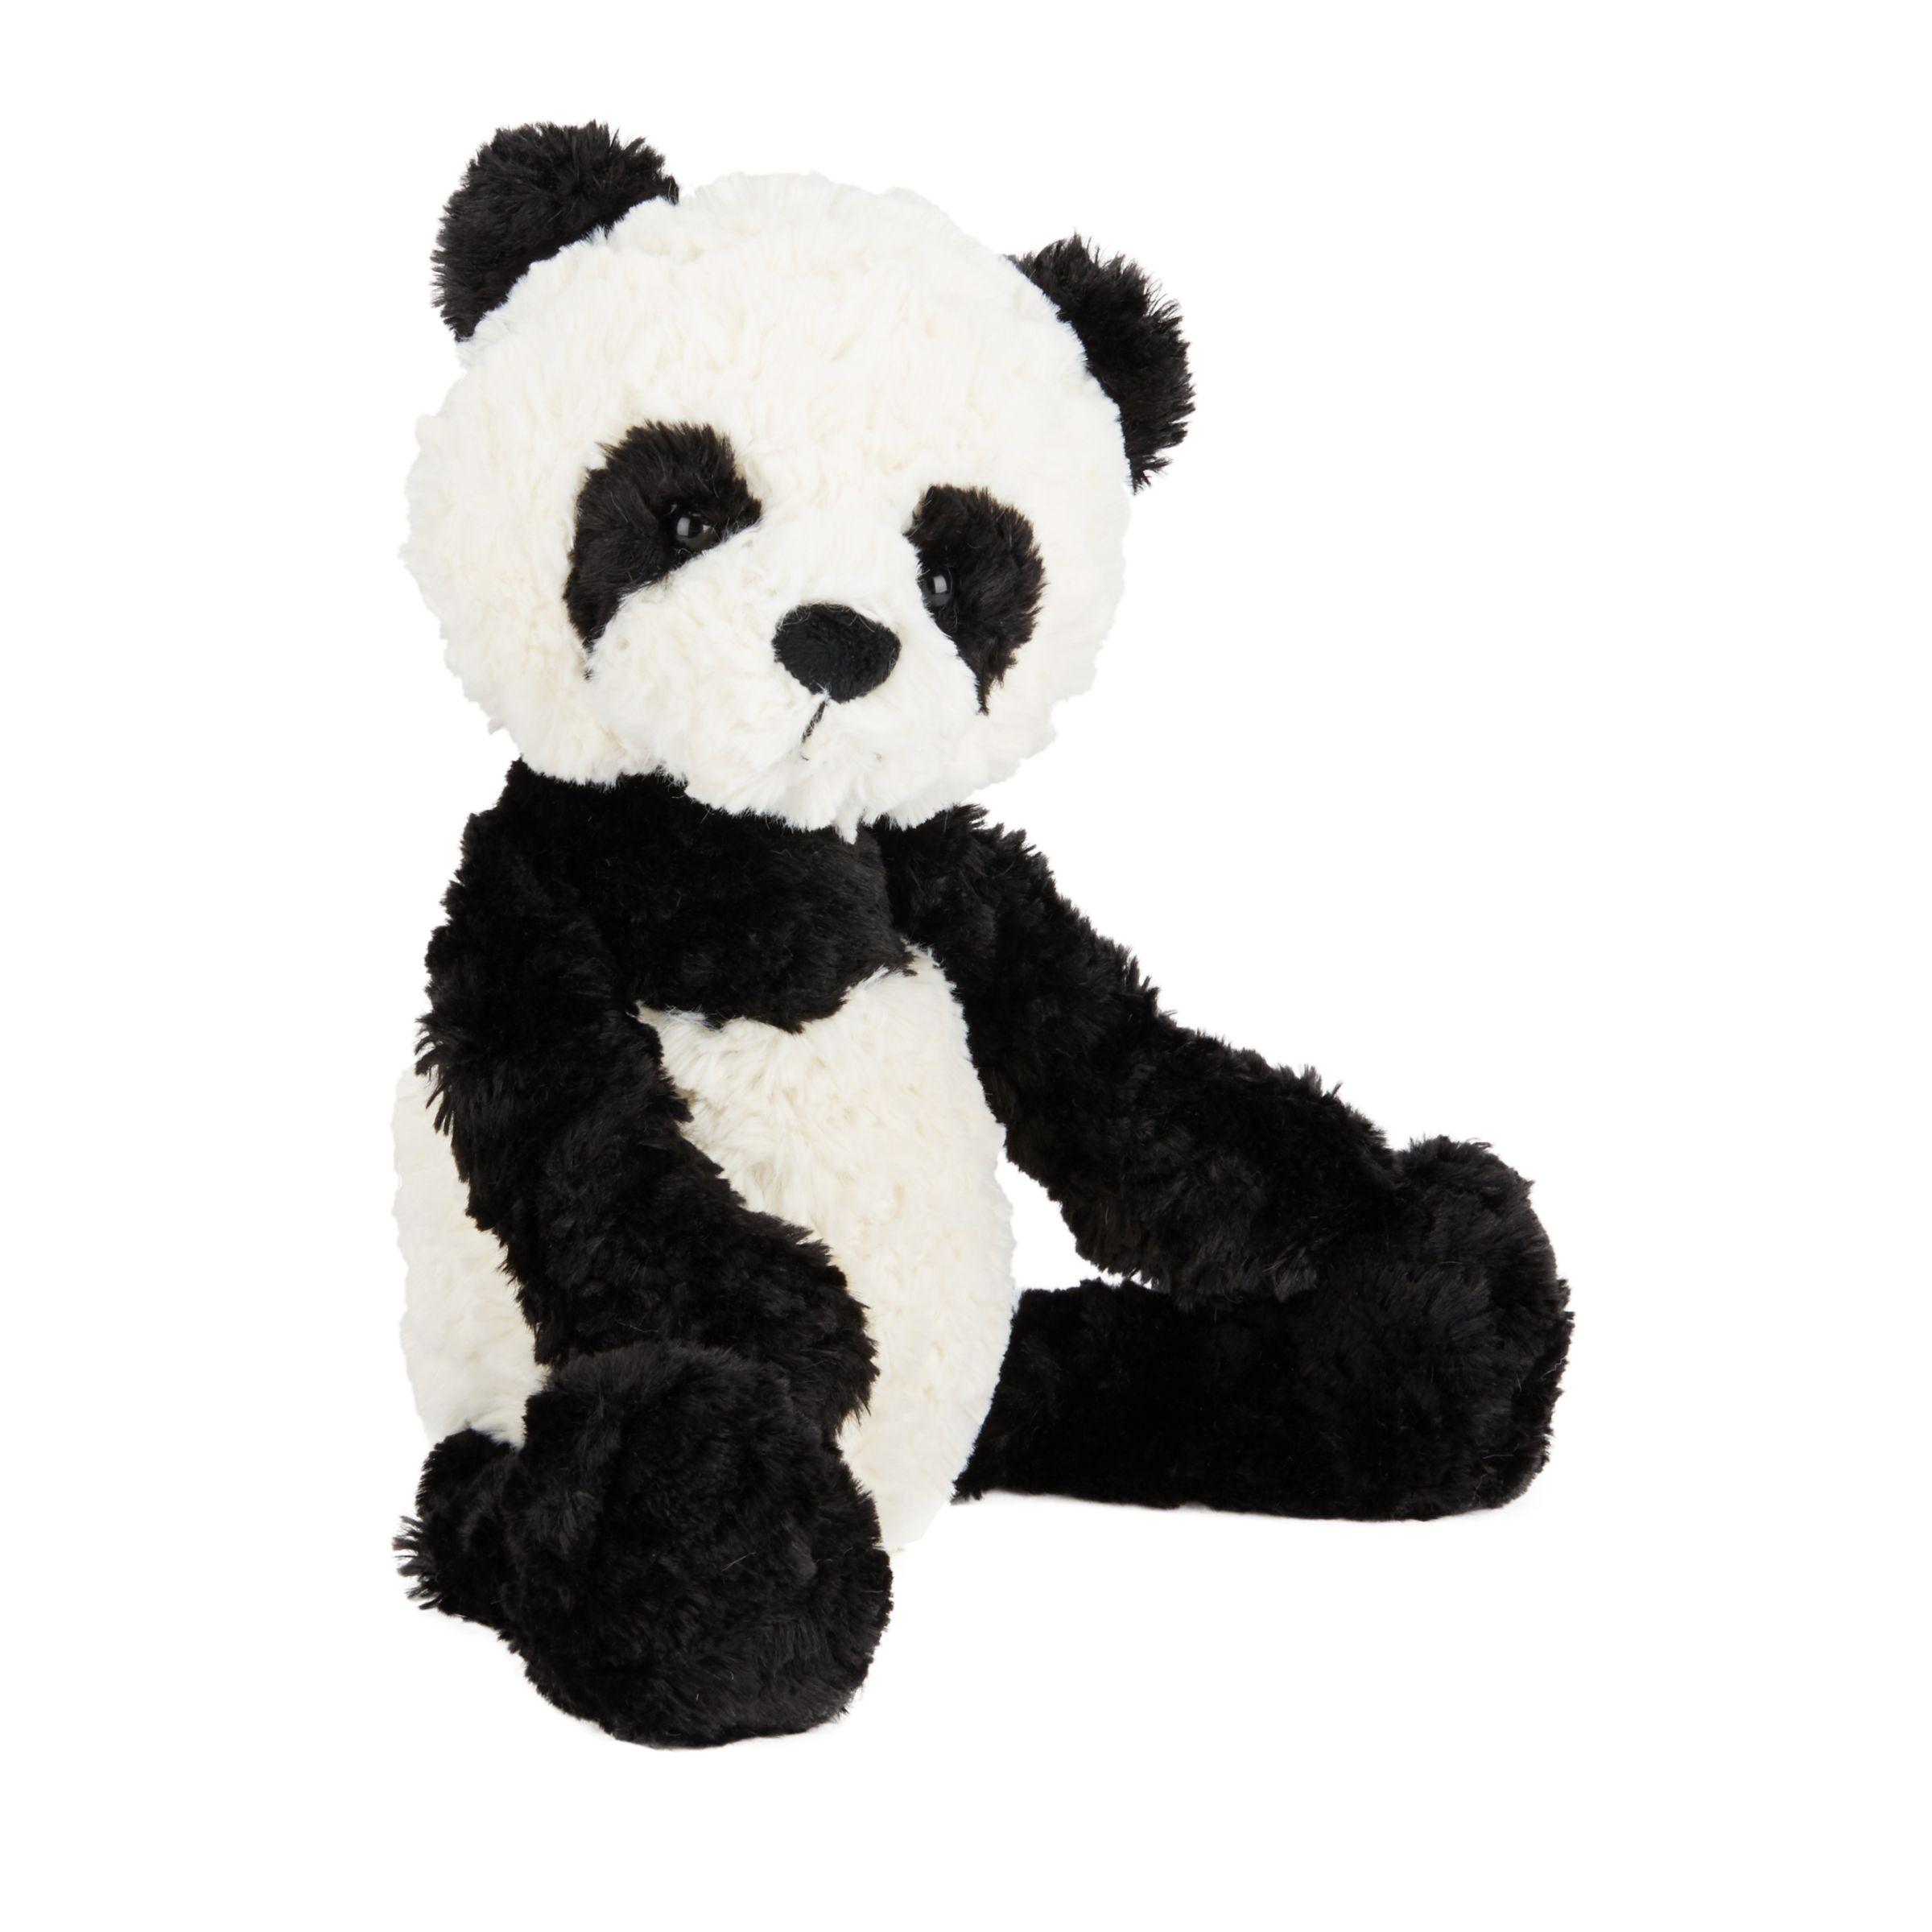 Jellycat Jellycat Mumble Panda Soft Toy